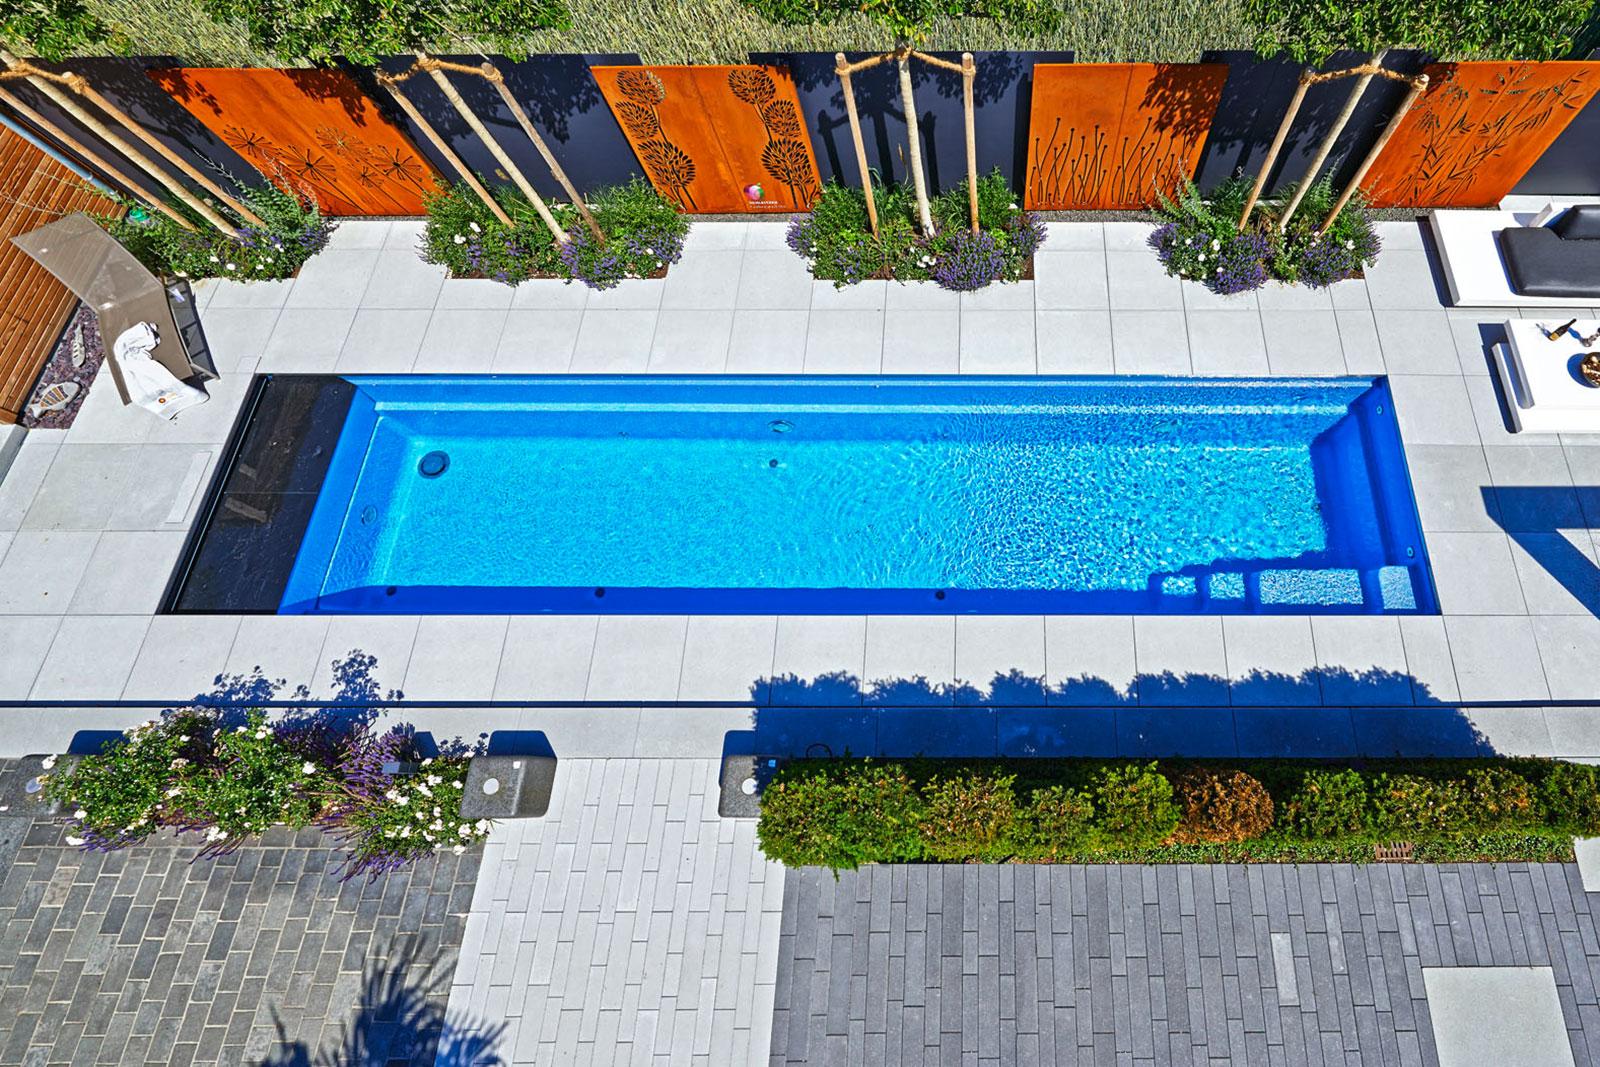 Pool Fertigbecken - Reps GmbH / Schwimmbad / Whirlpool / Poolservice